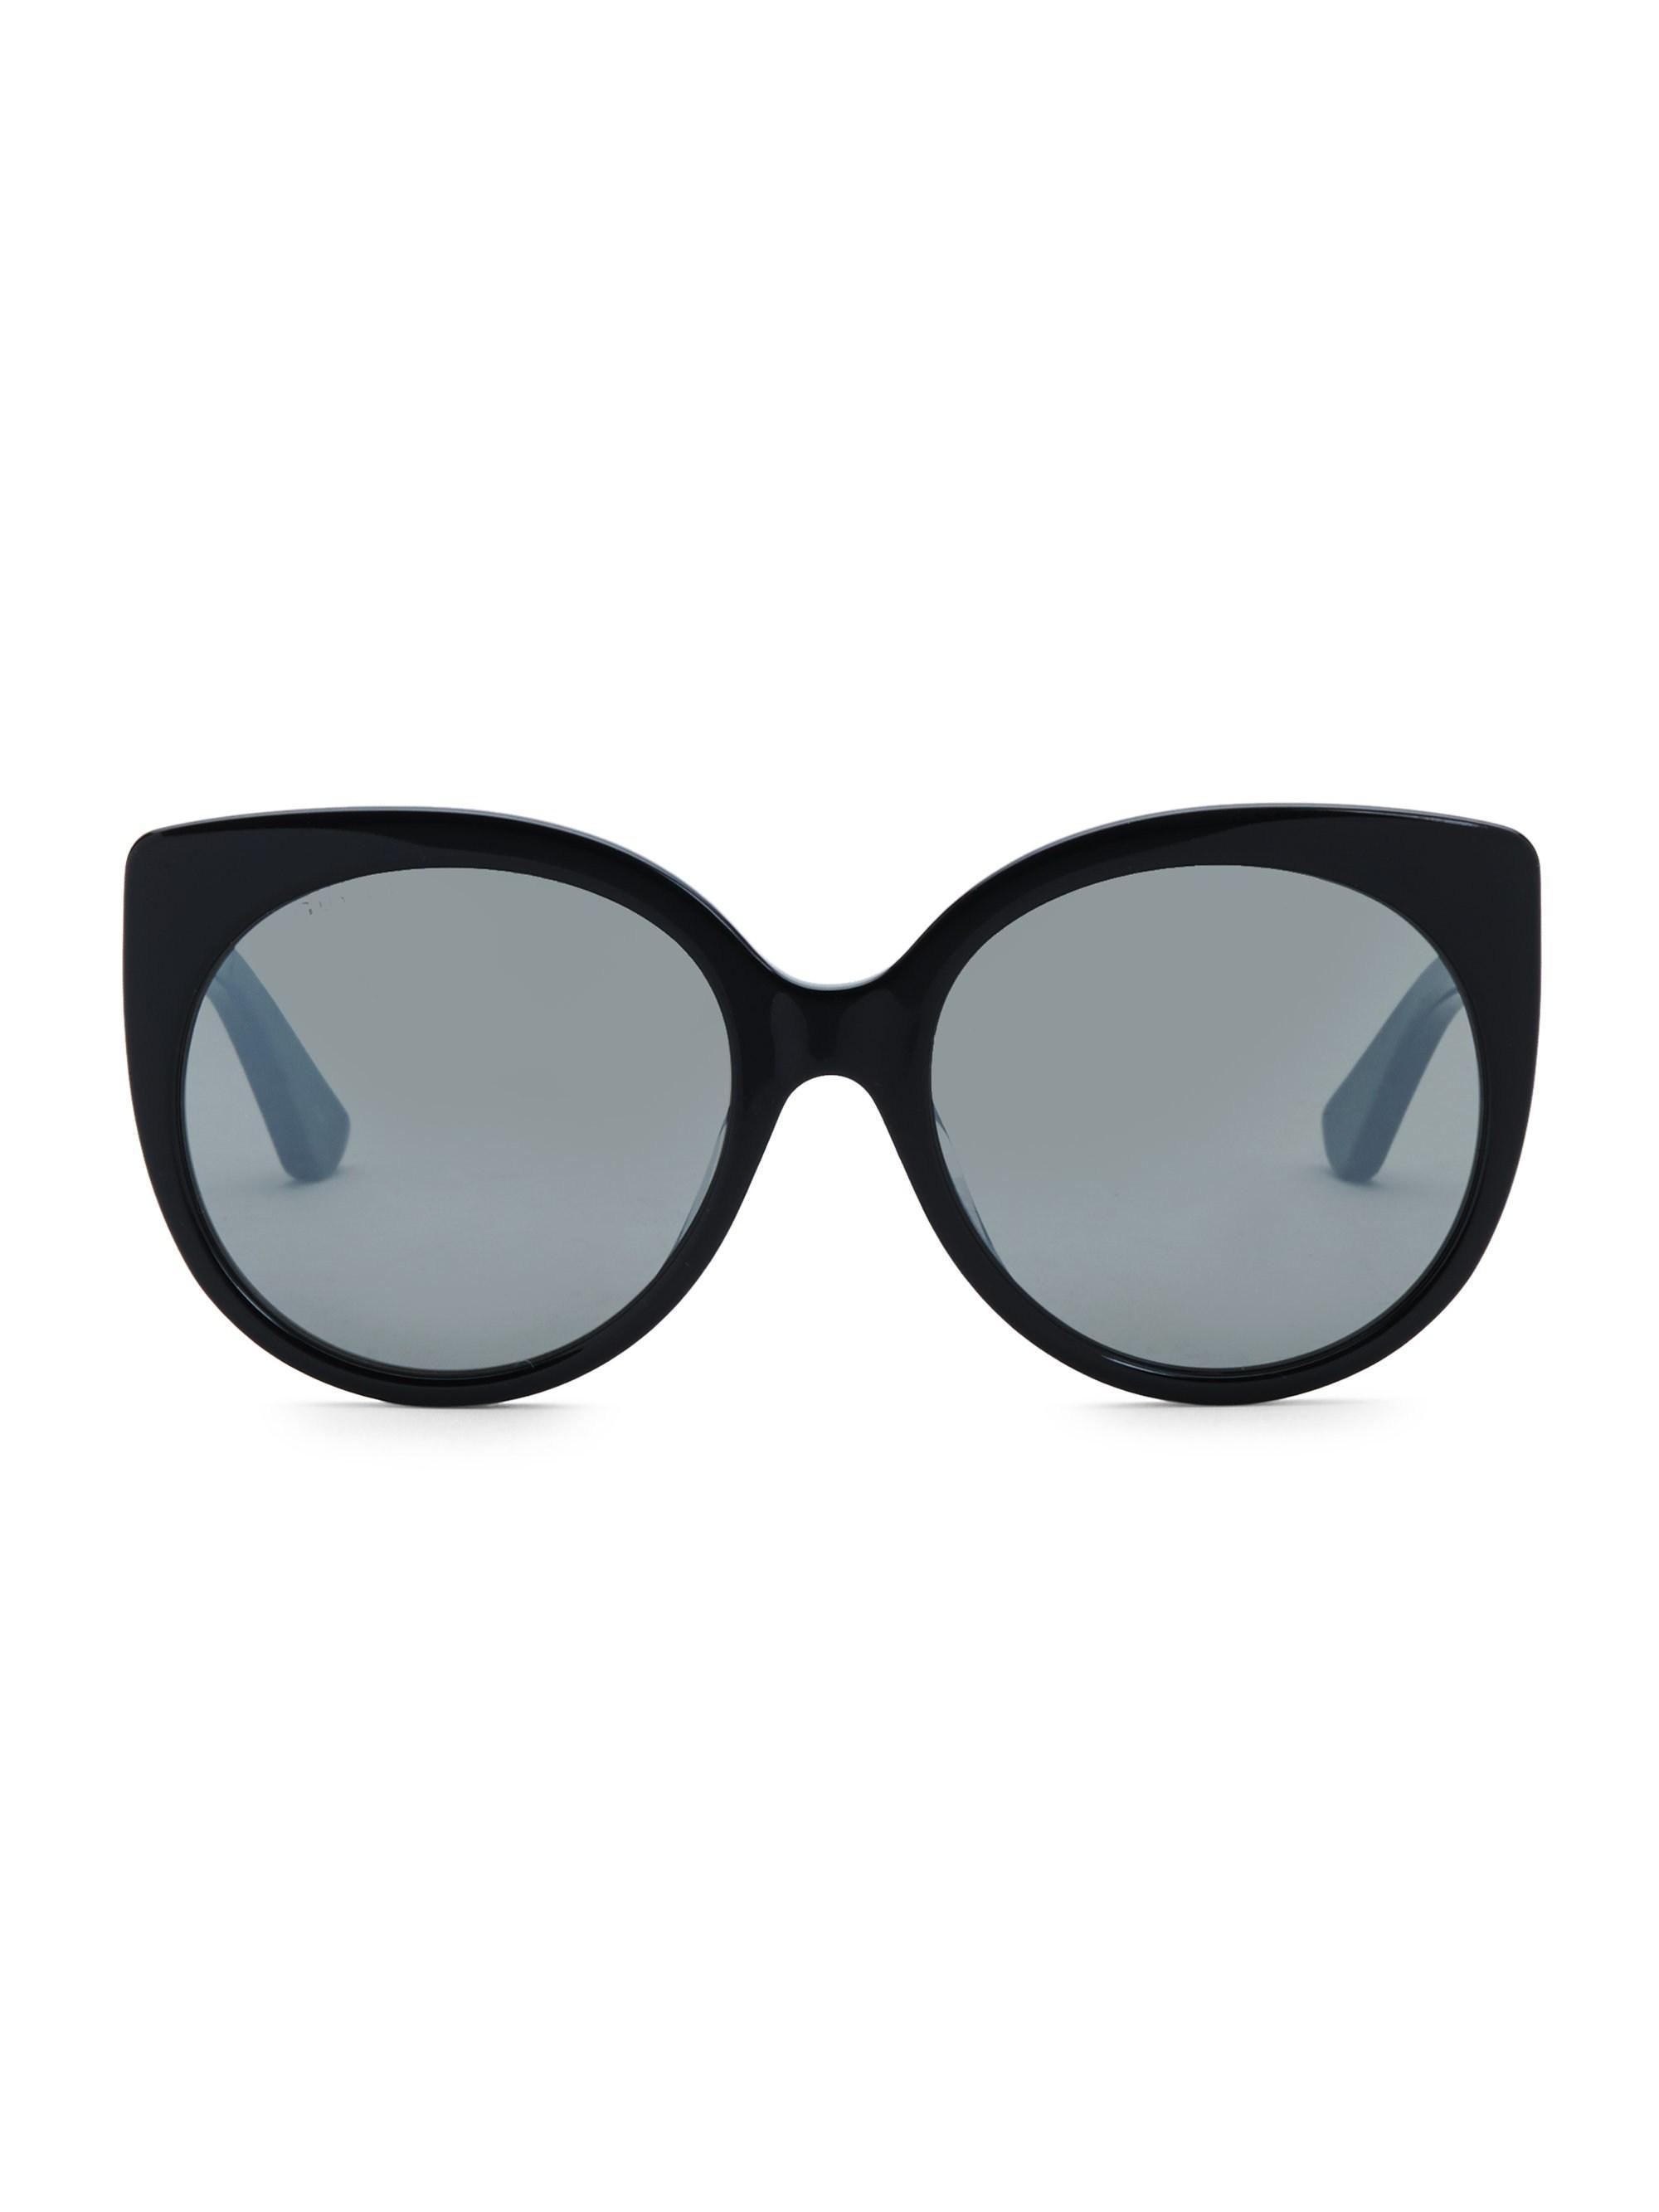 5f71a0d21a Gucci Urban 57mm Cat Eye Sunglasses in Black - Lyst